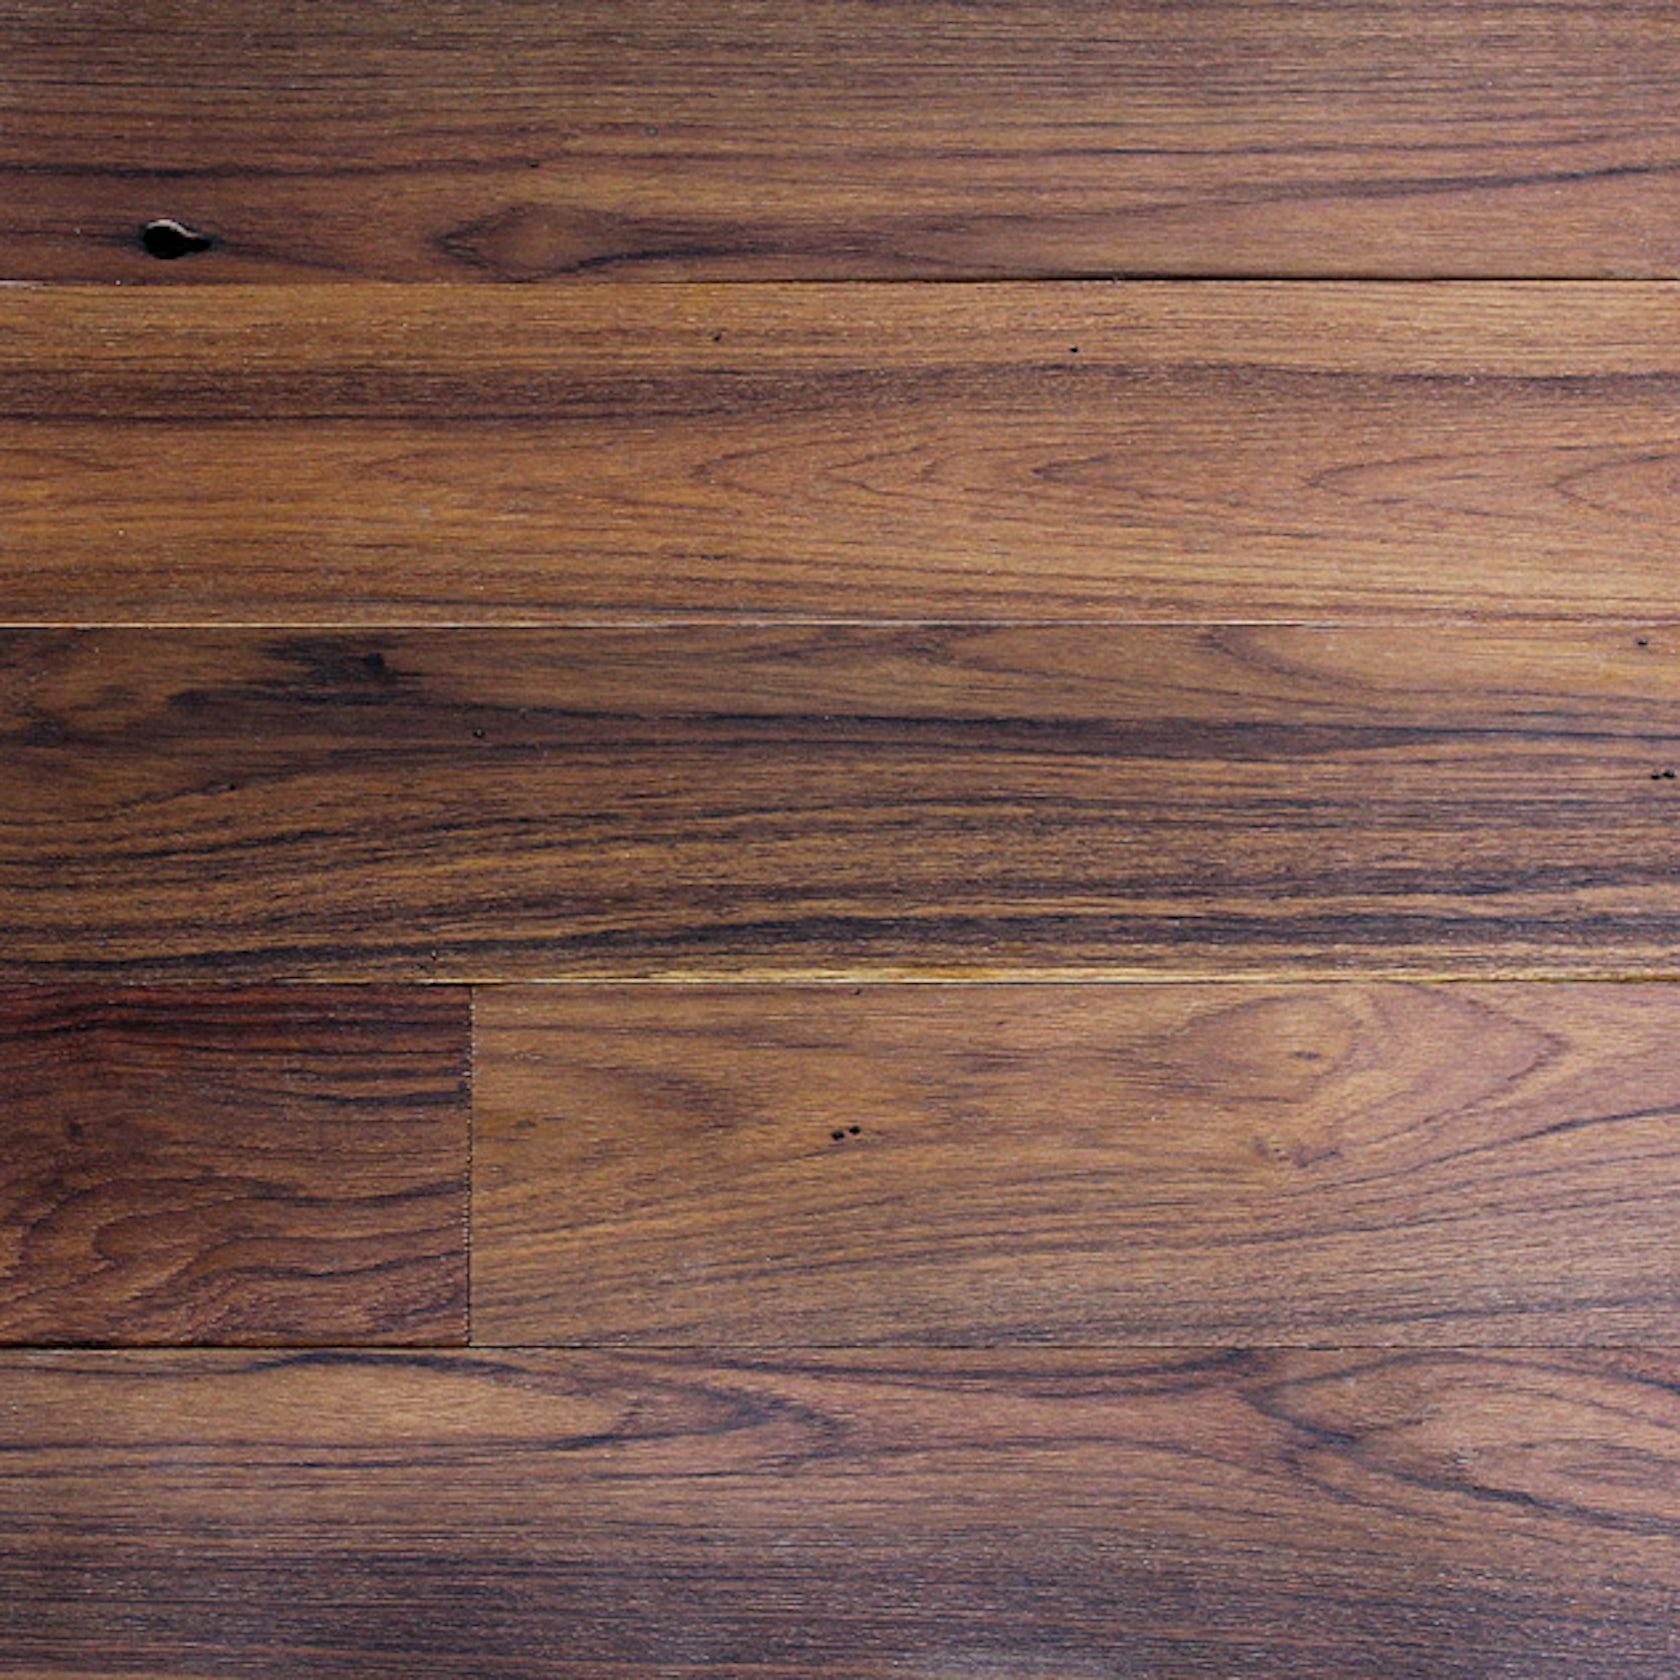 Reclaimed Surfaced Long Plank Teak Flooring Paneling